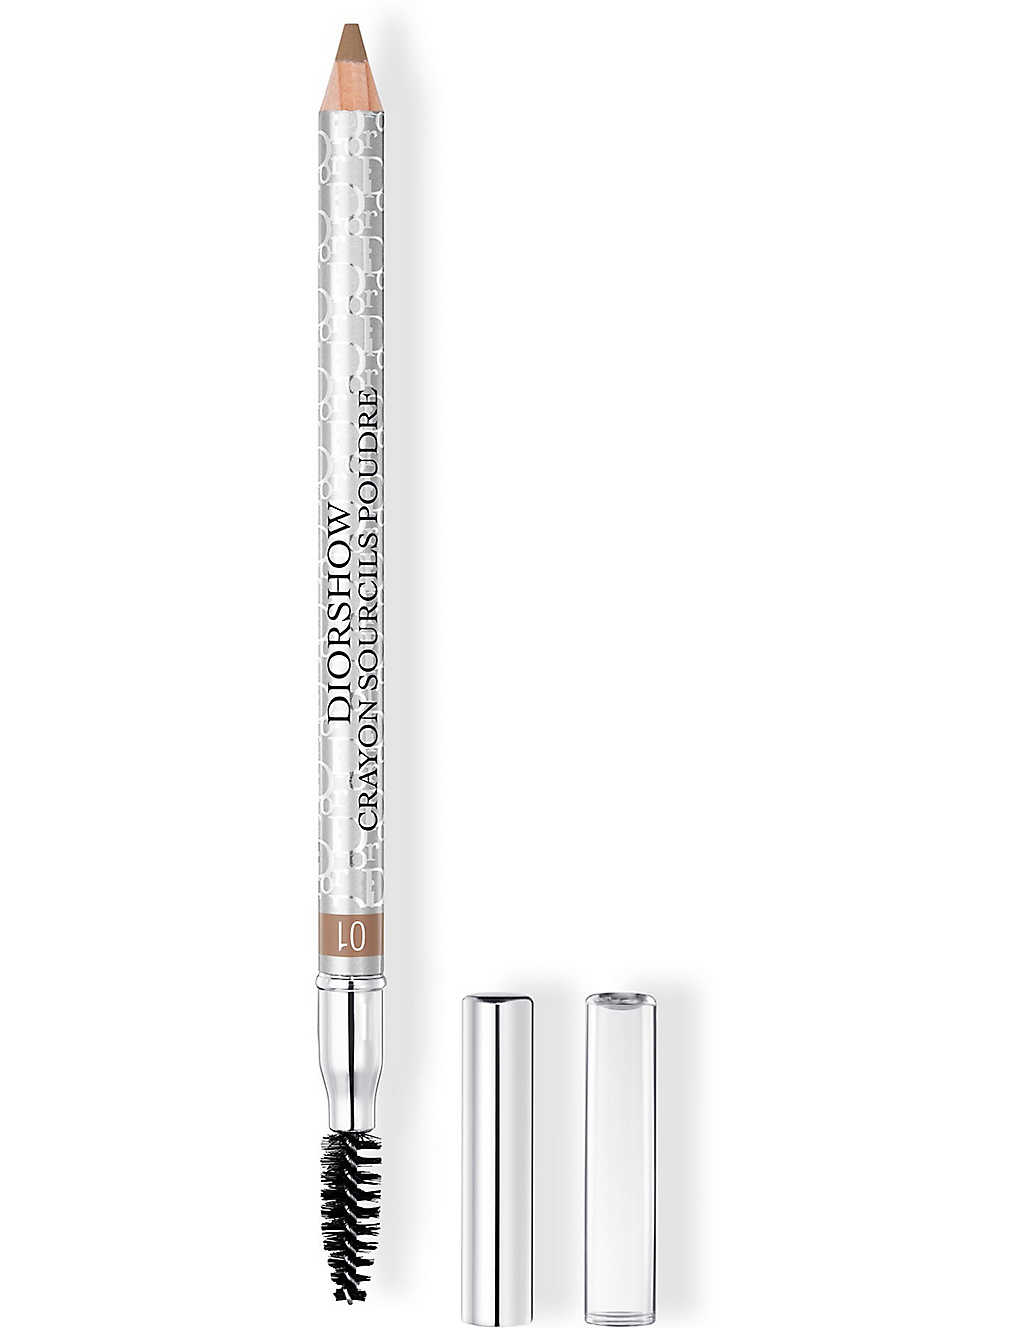 Diorshow Crayon Sourcils Poudre eyebrow pencil